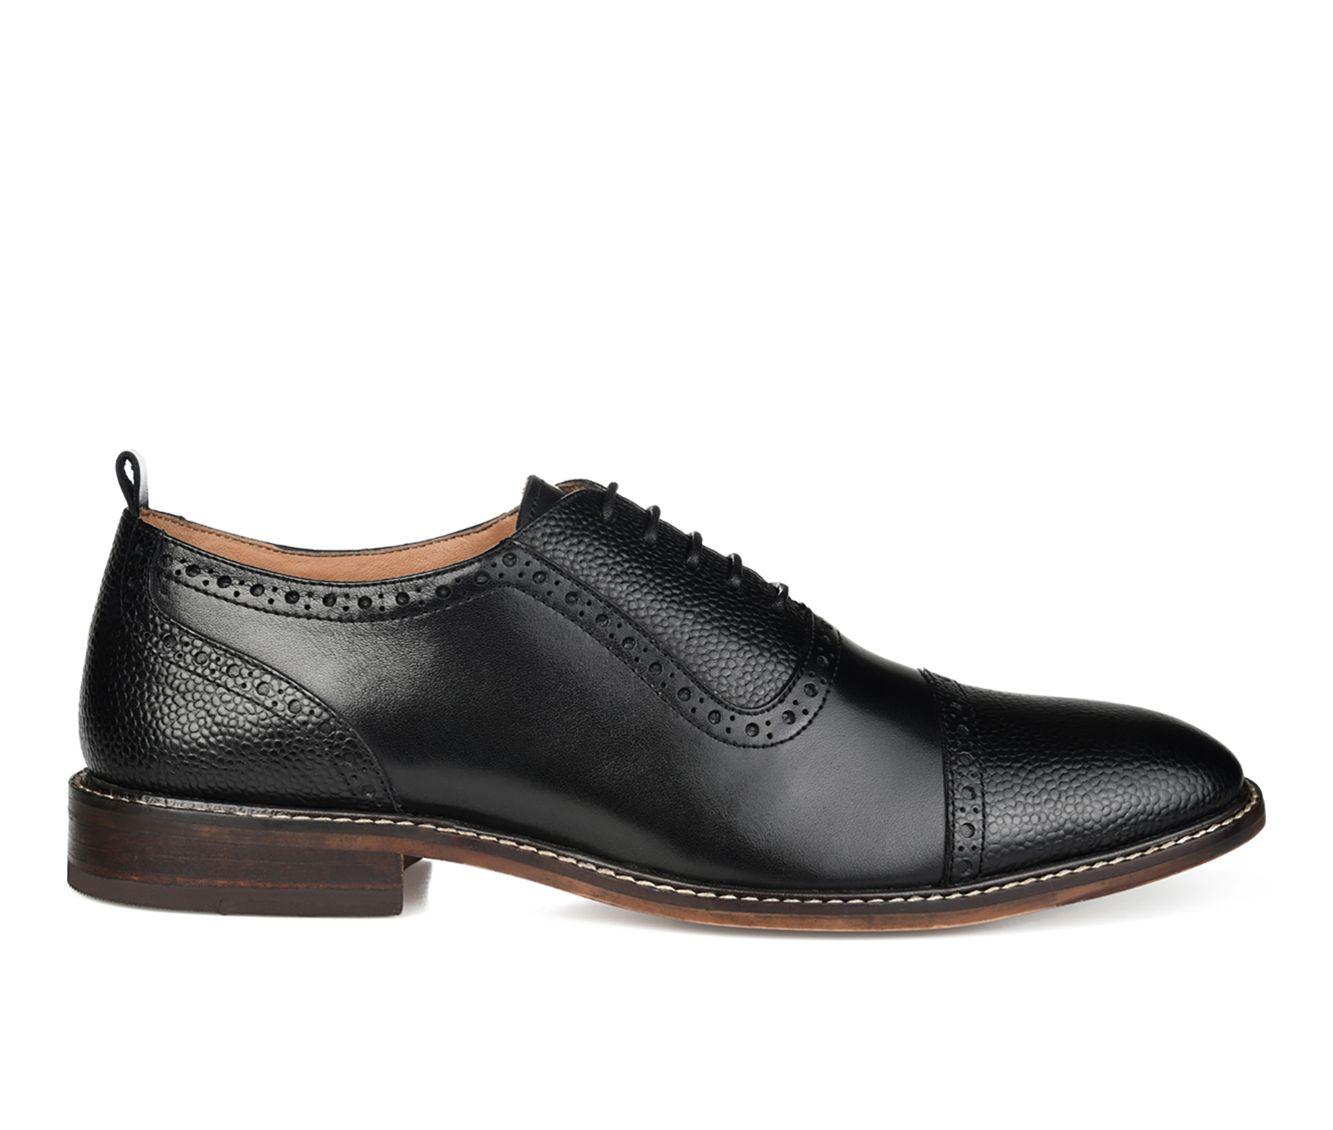 Thomas Vine Lincoln Men S Dress Shoe Mens Italian Dress Shoes Dress Shoes Men Dress Shoes [ 1130 x 1333 Pixel ]